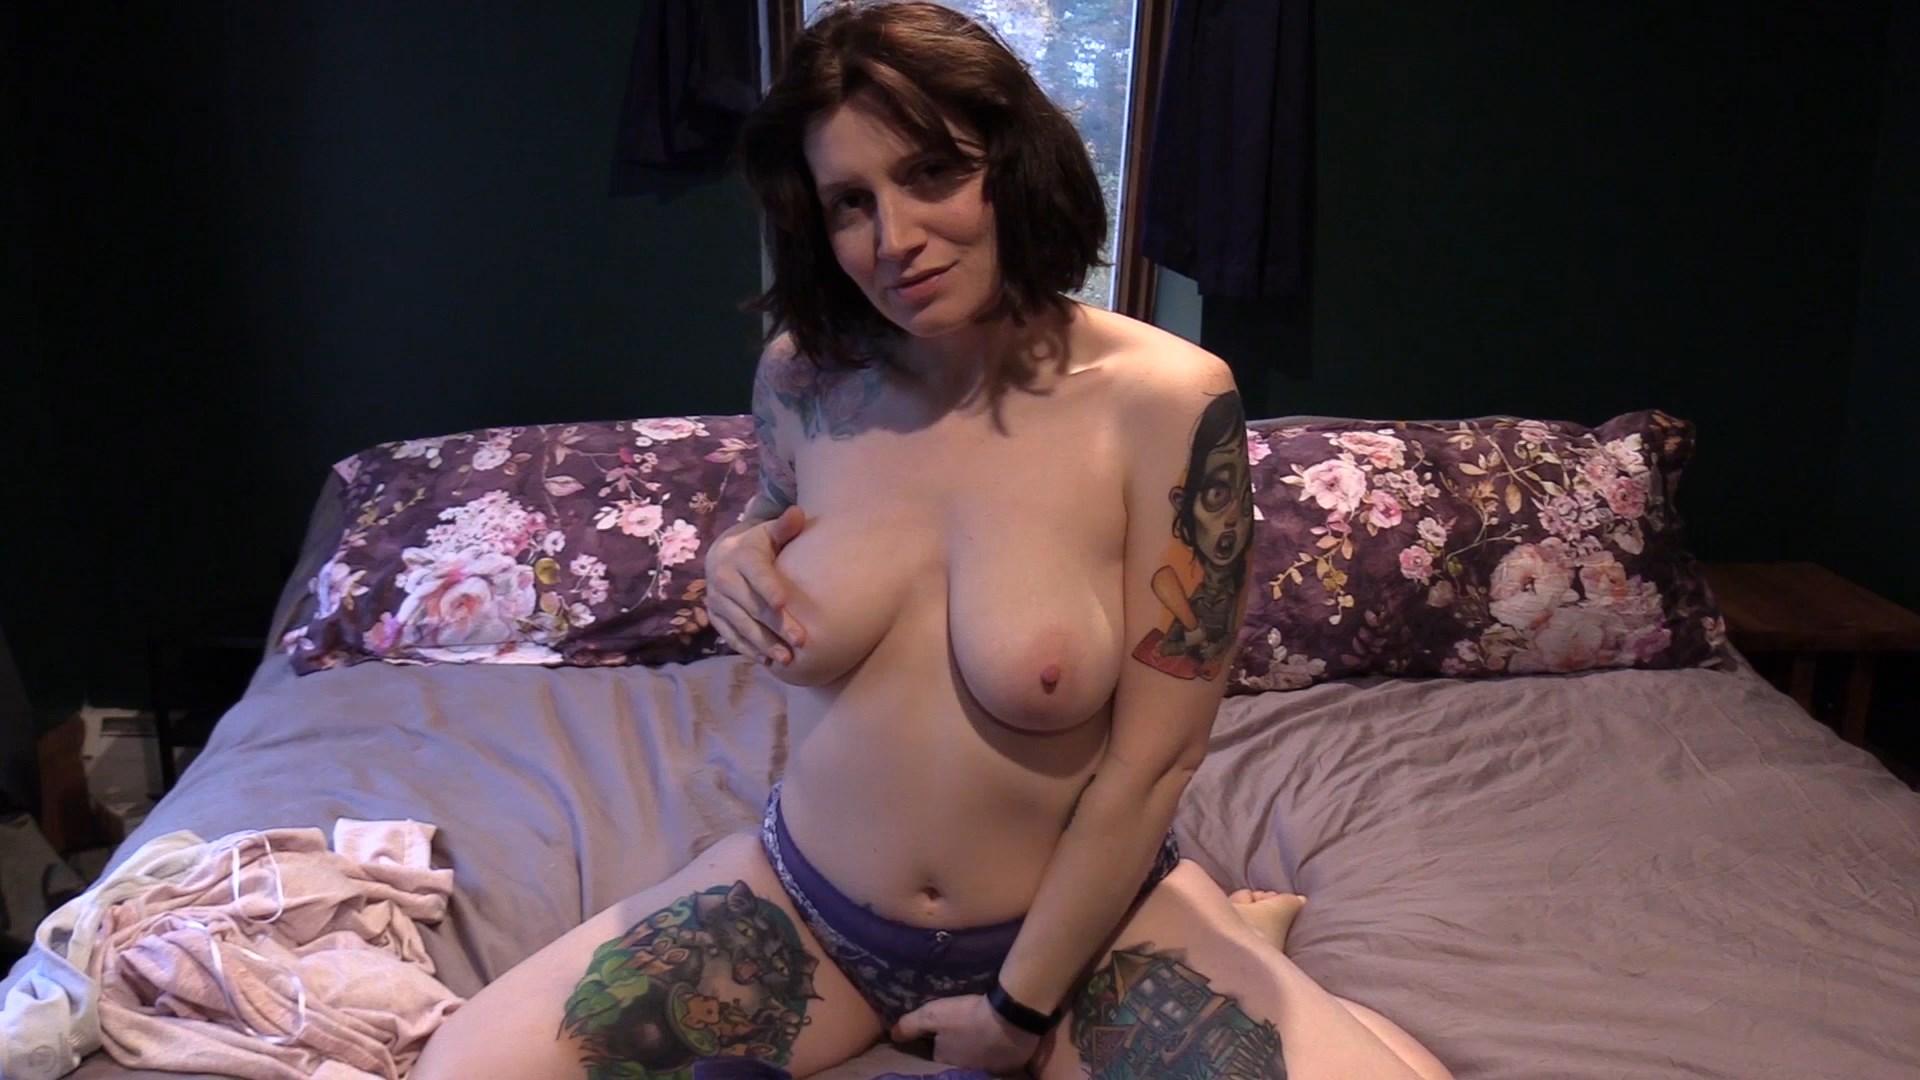 Bettie Bondage - Mom Found Your Porn Stash